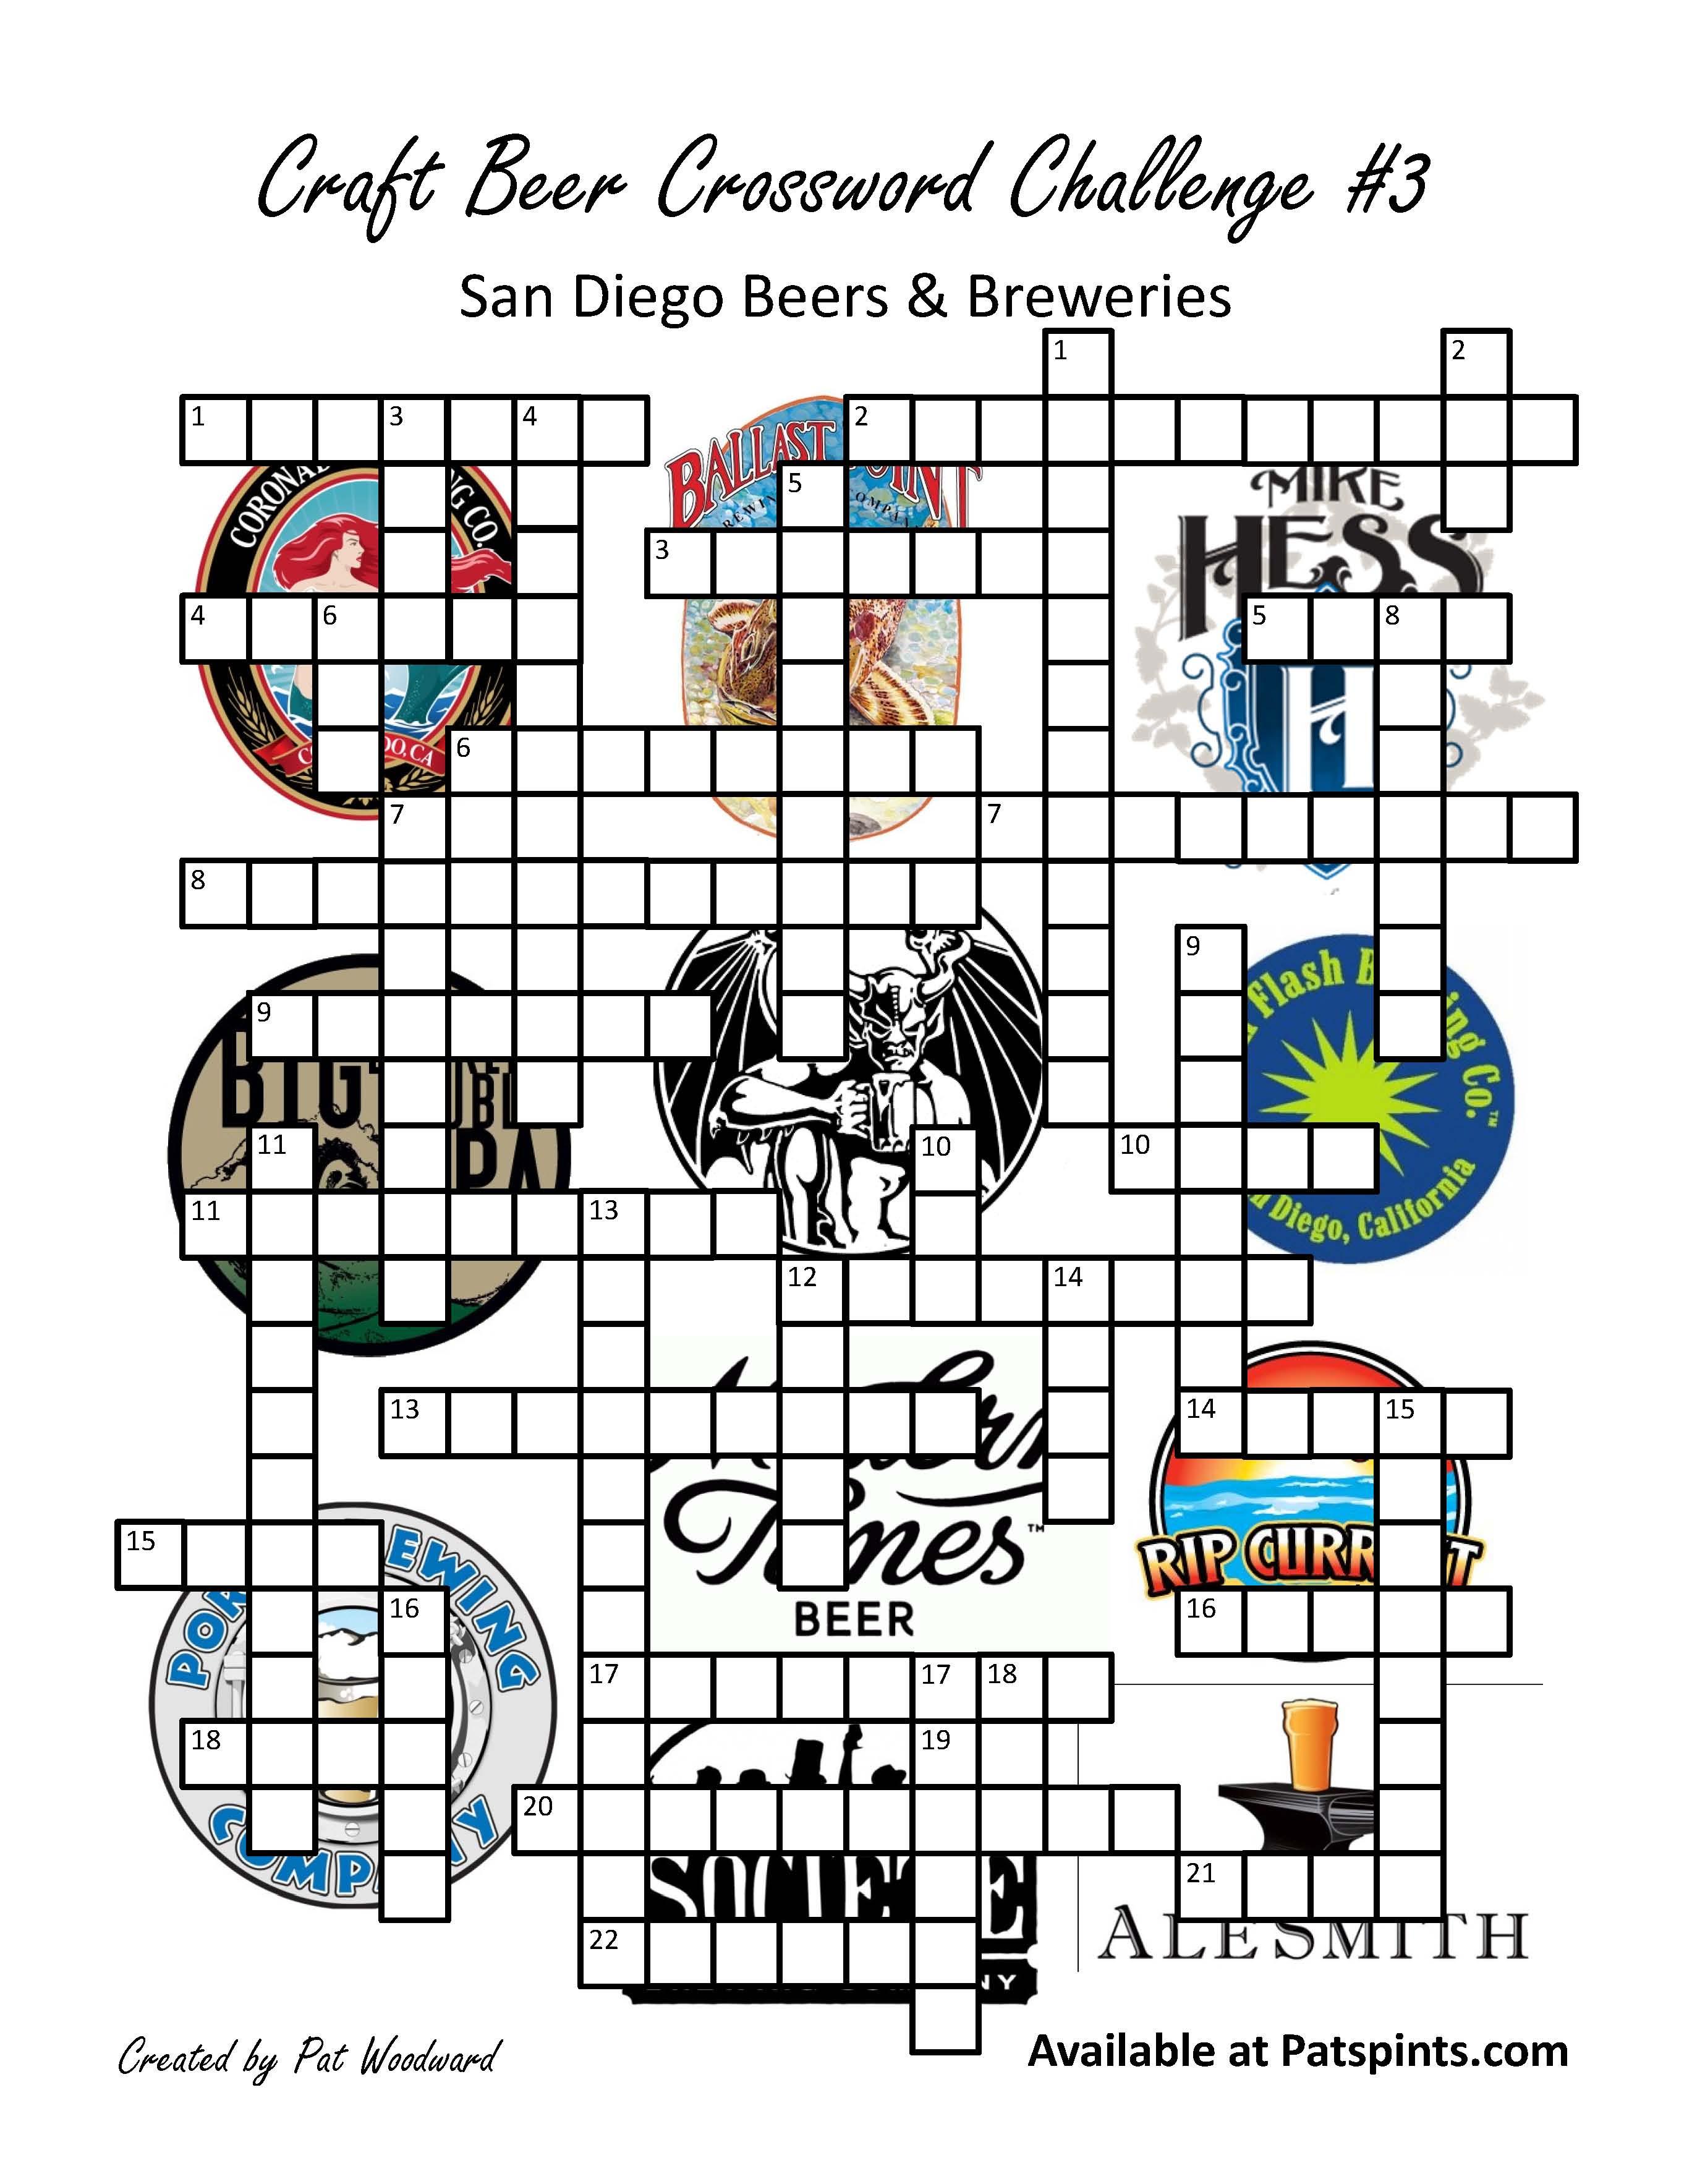 San Diego Craft Beer Crossword Puzzle | Pat's Pints